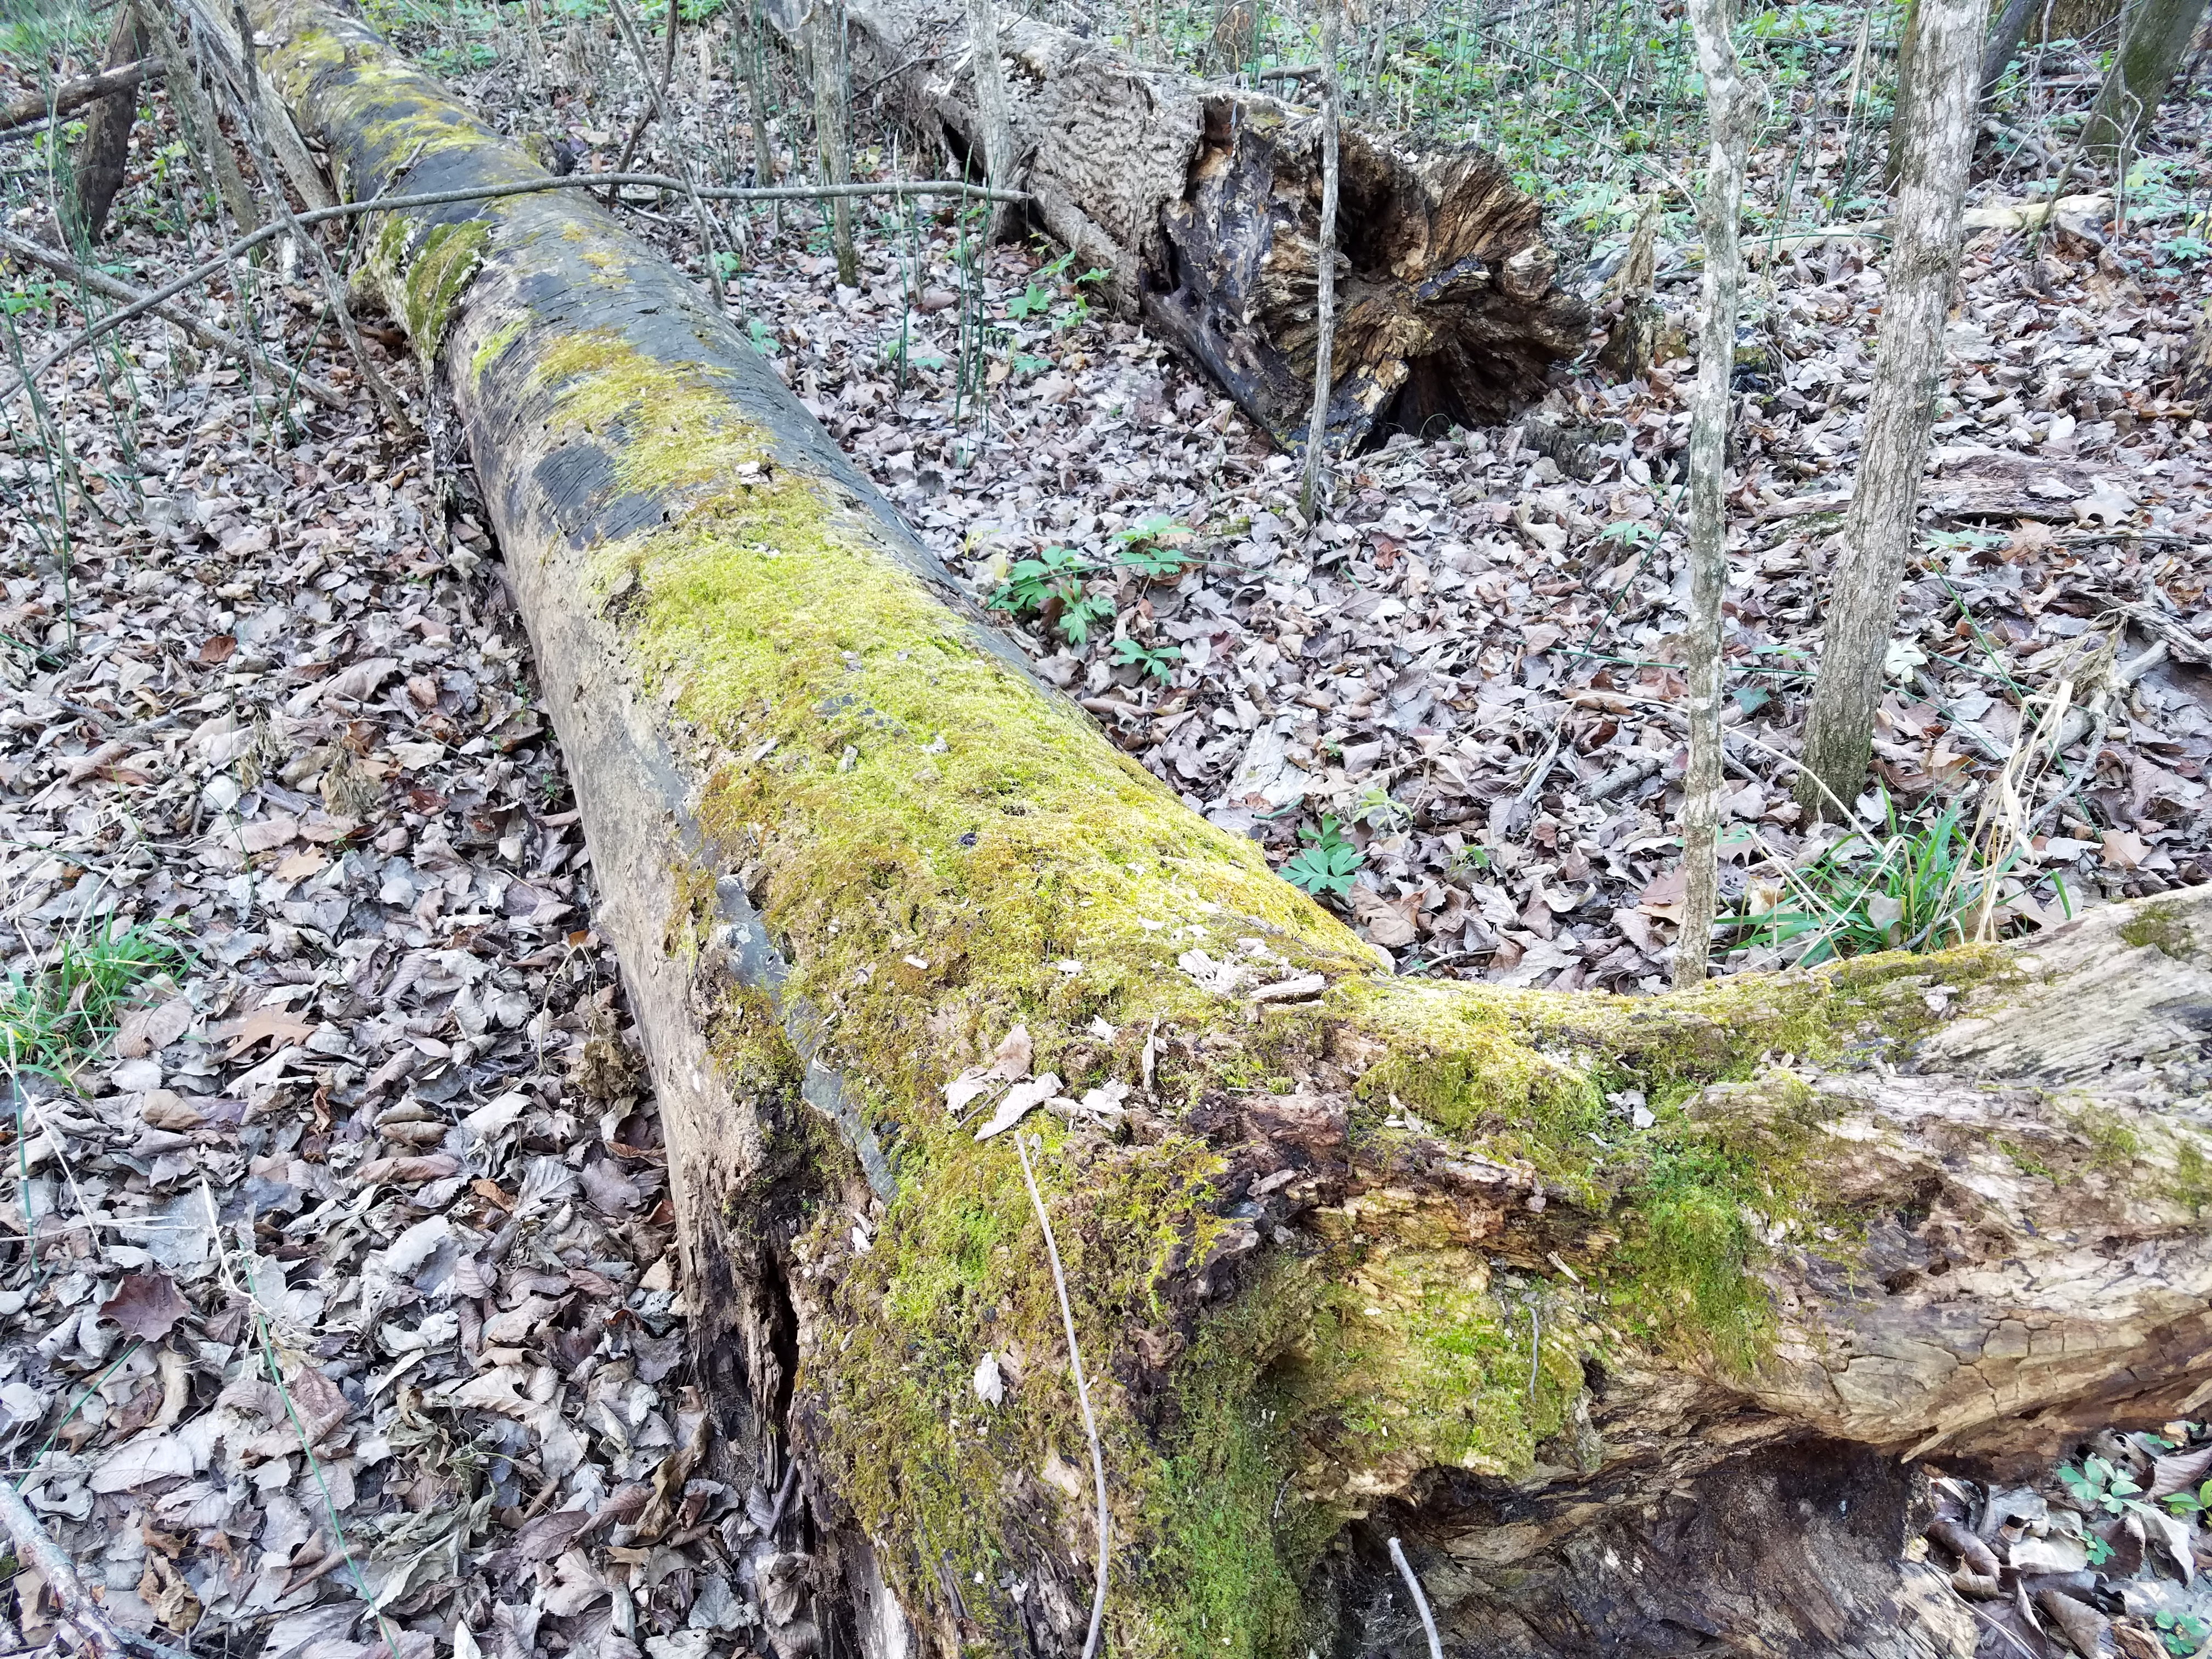 mossy-log-761.jpg